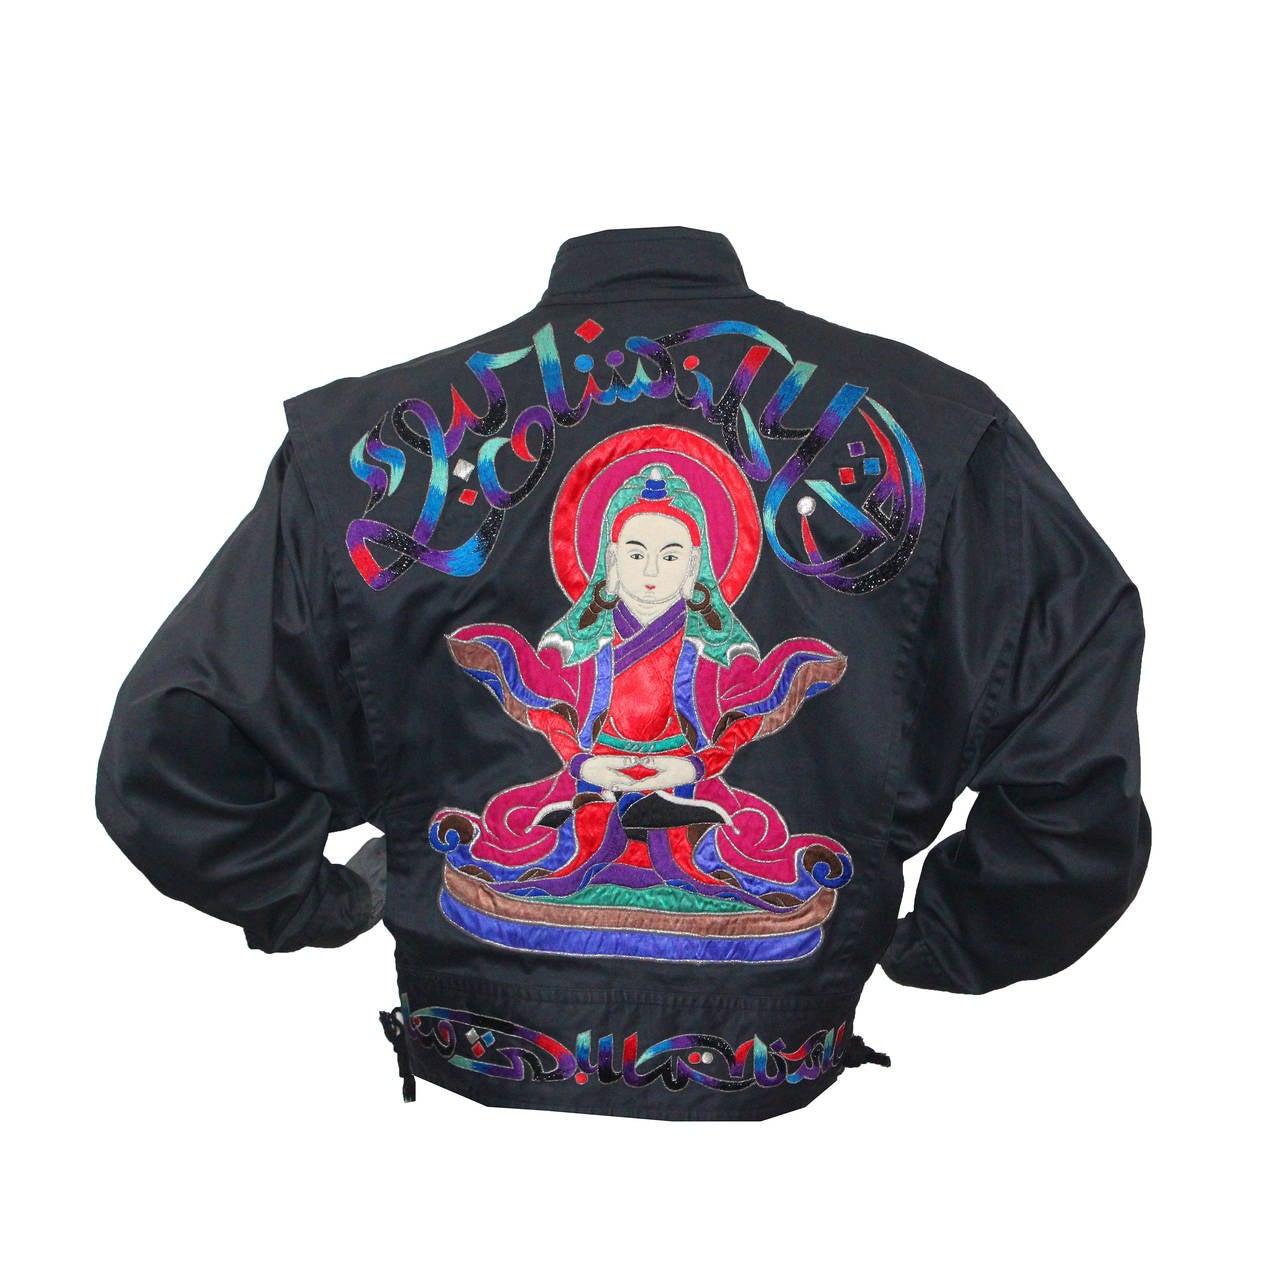 Fine and rare 1980s Kansai Yamamoto Embroidered Buddha Bomber Jacket 1